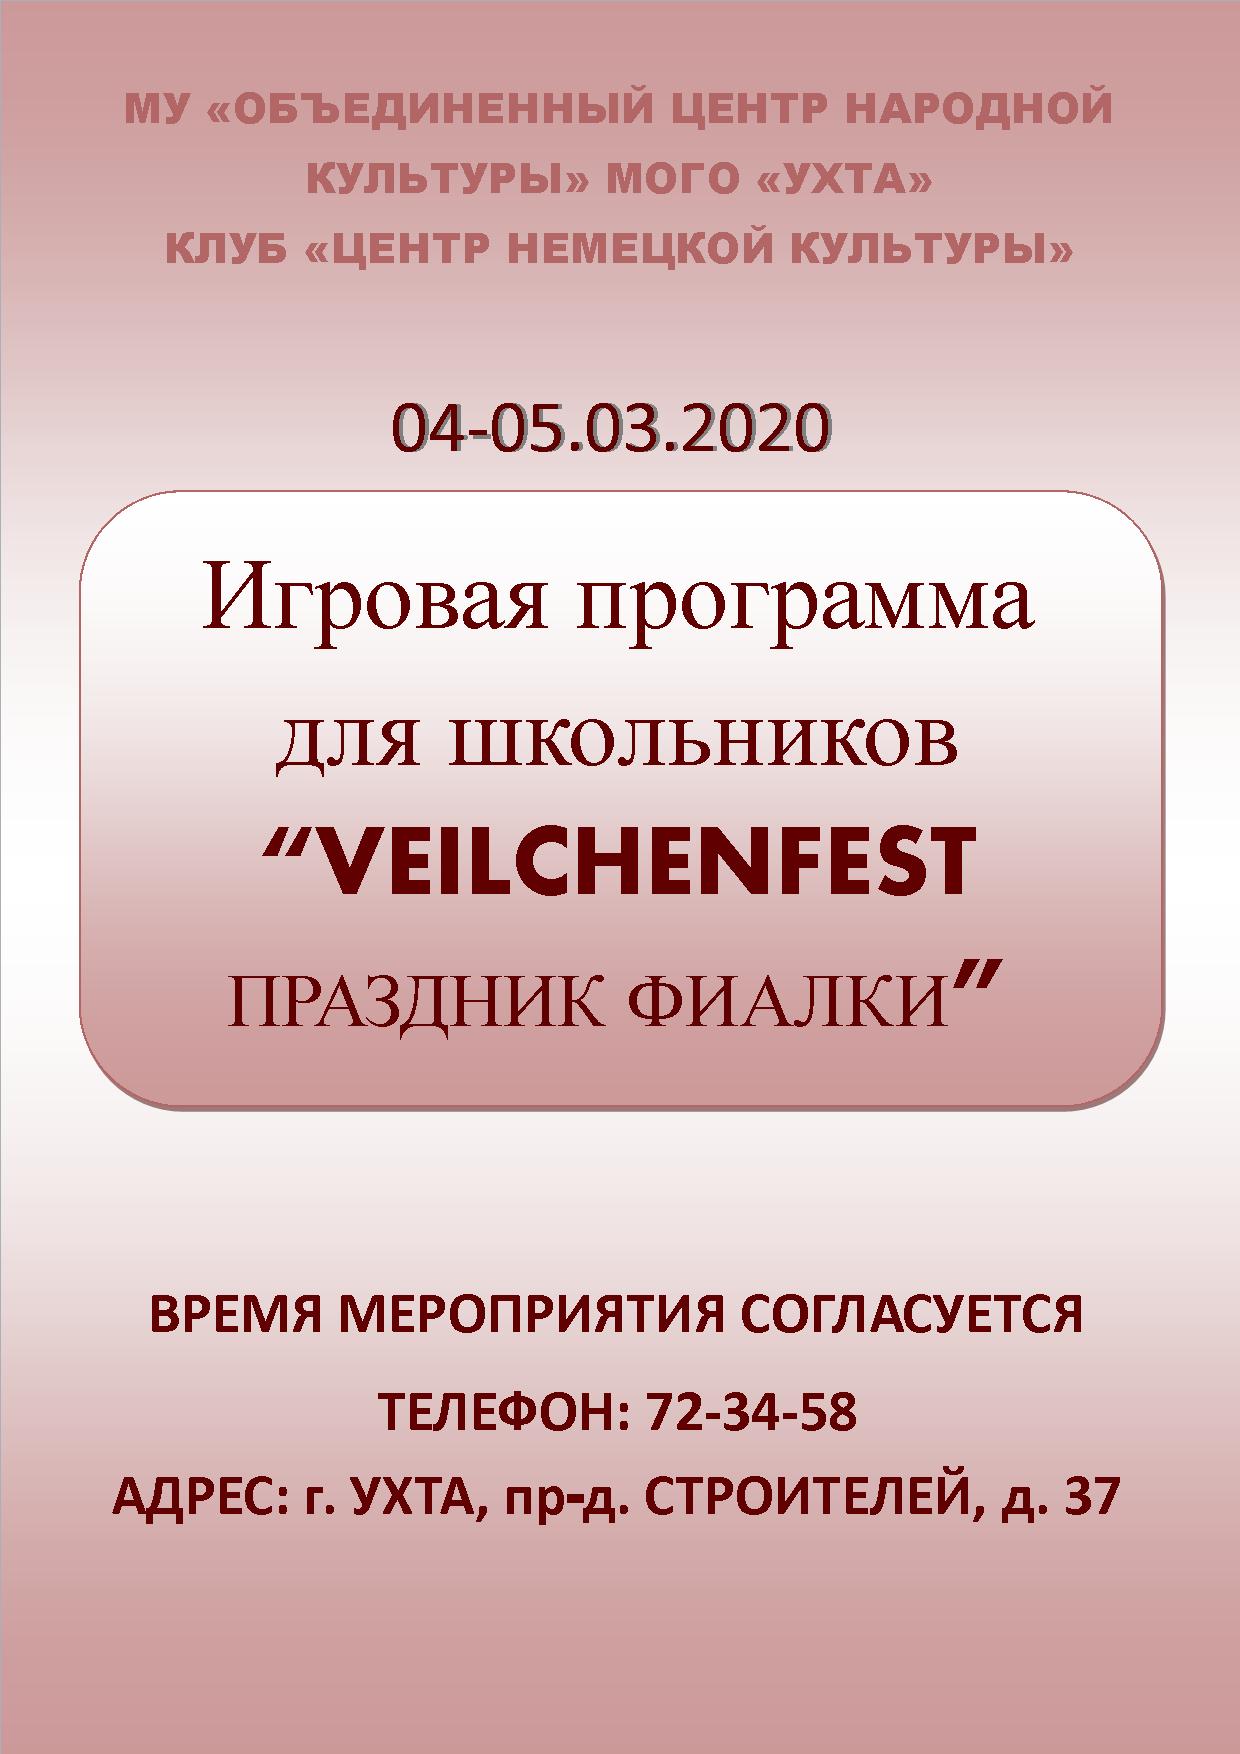 АФИША ЦНК МАРТ 2020